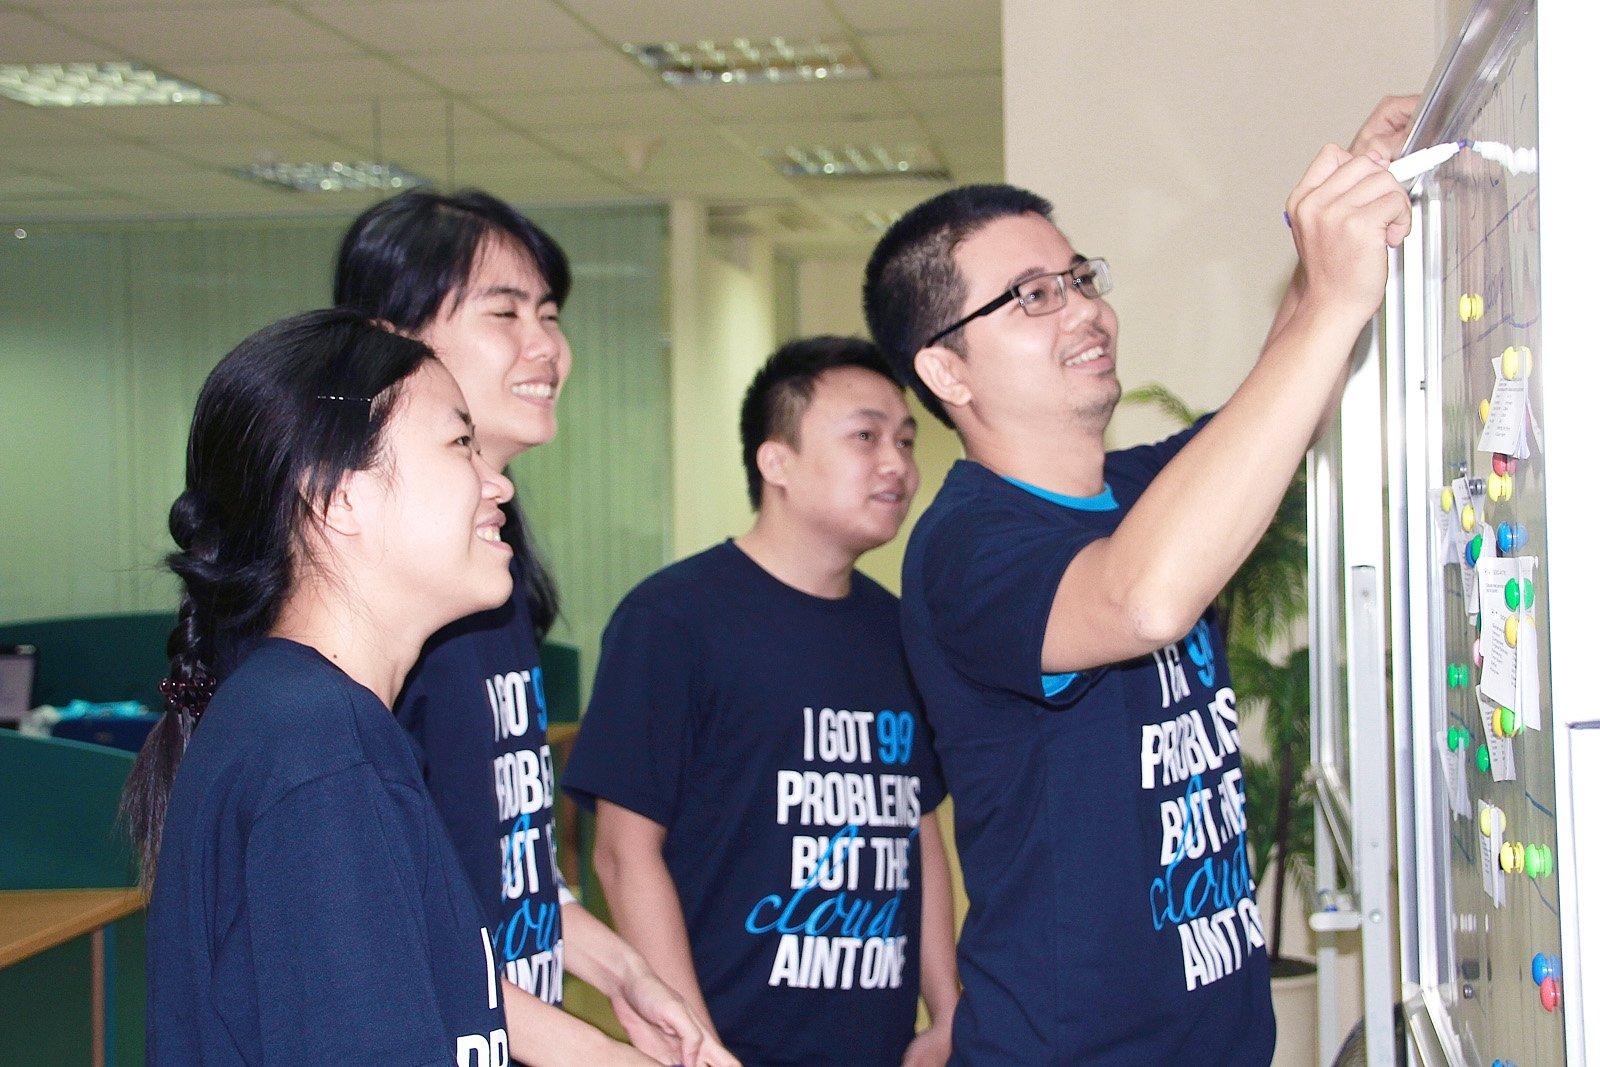 07-Hanoi-Cods-Team